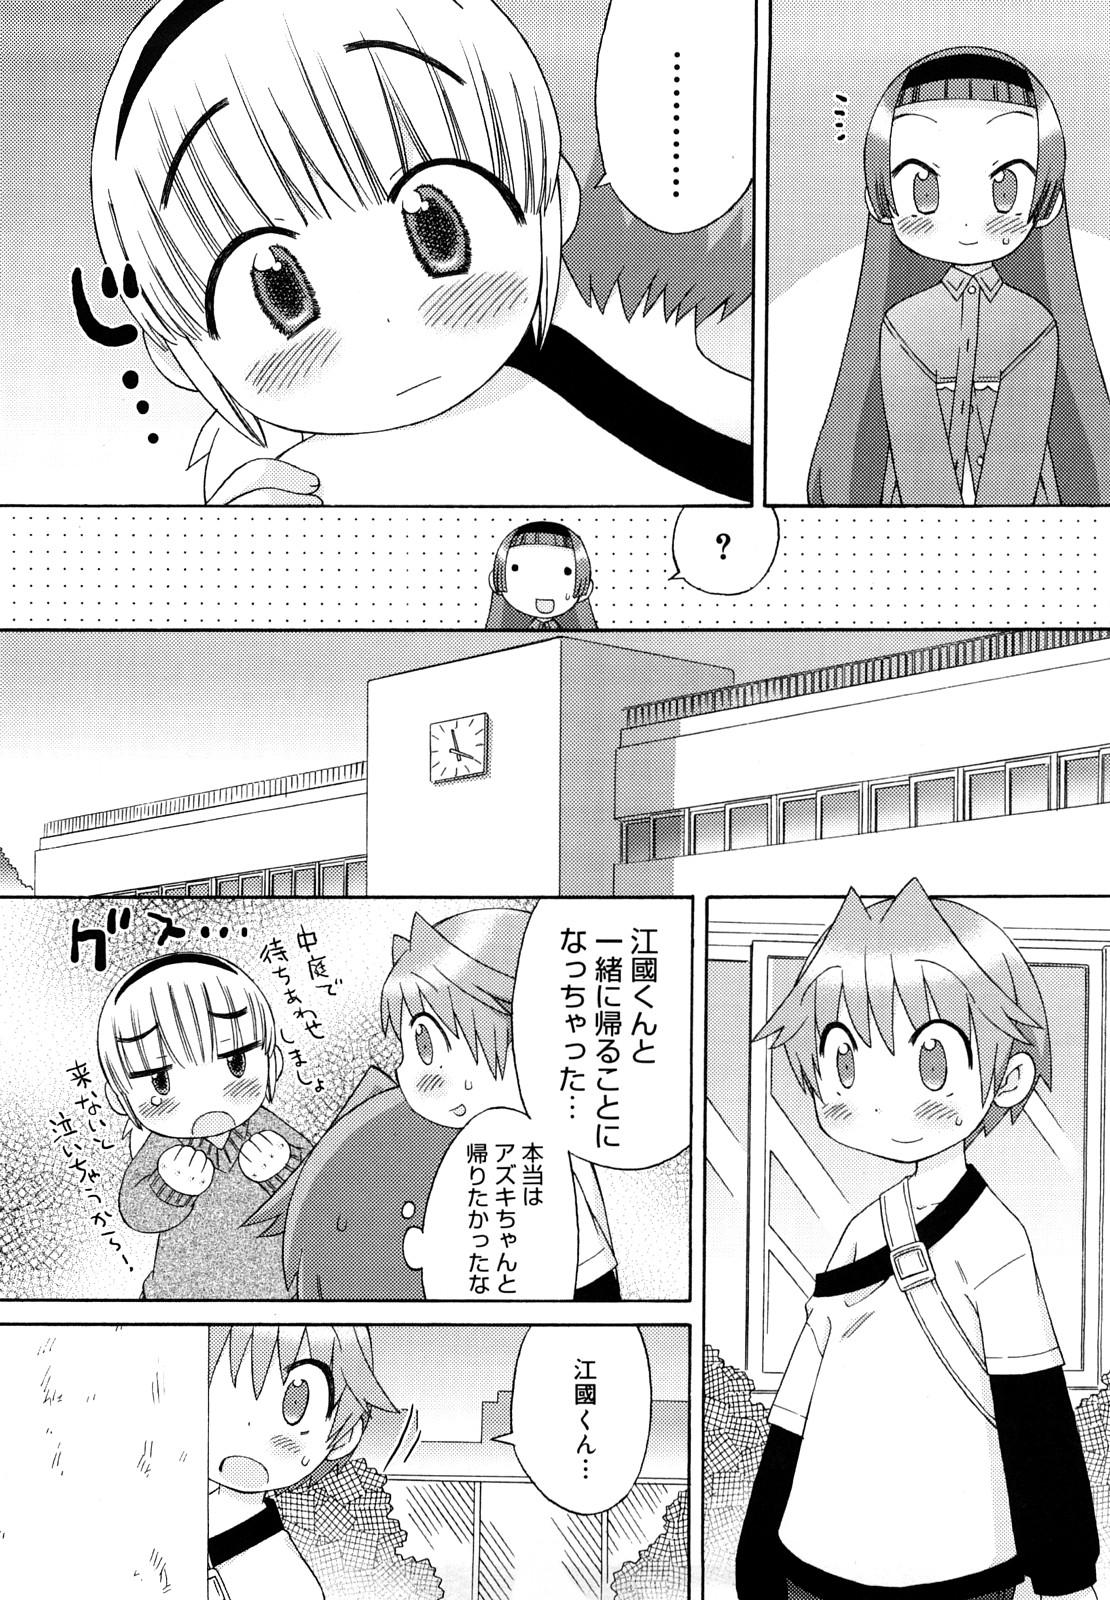 Hatsuden Pandakun! Shinsouban 154